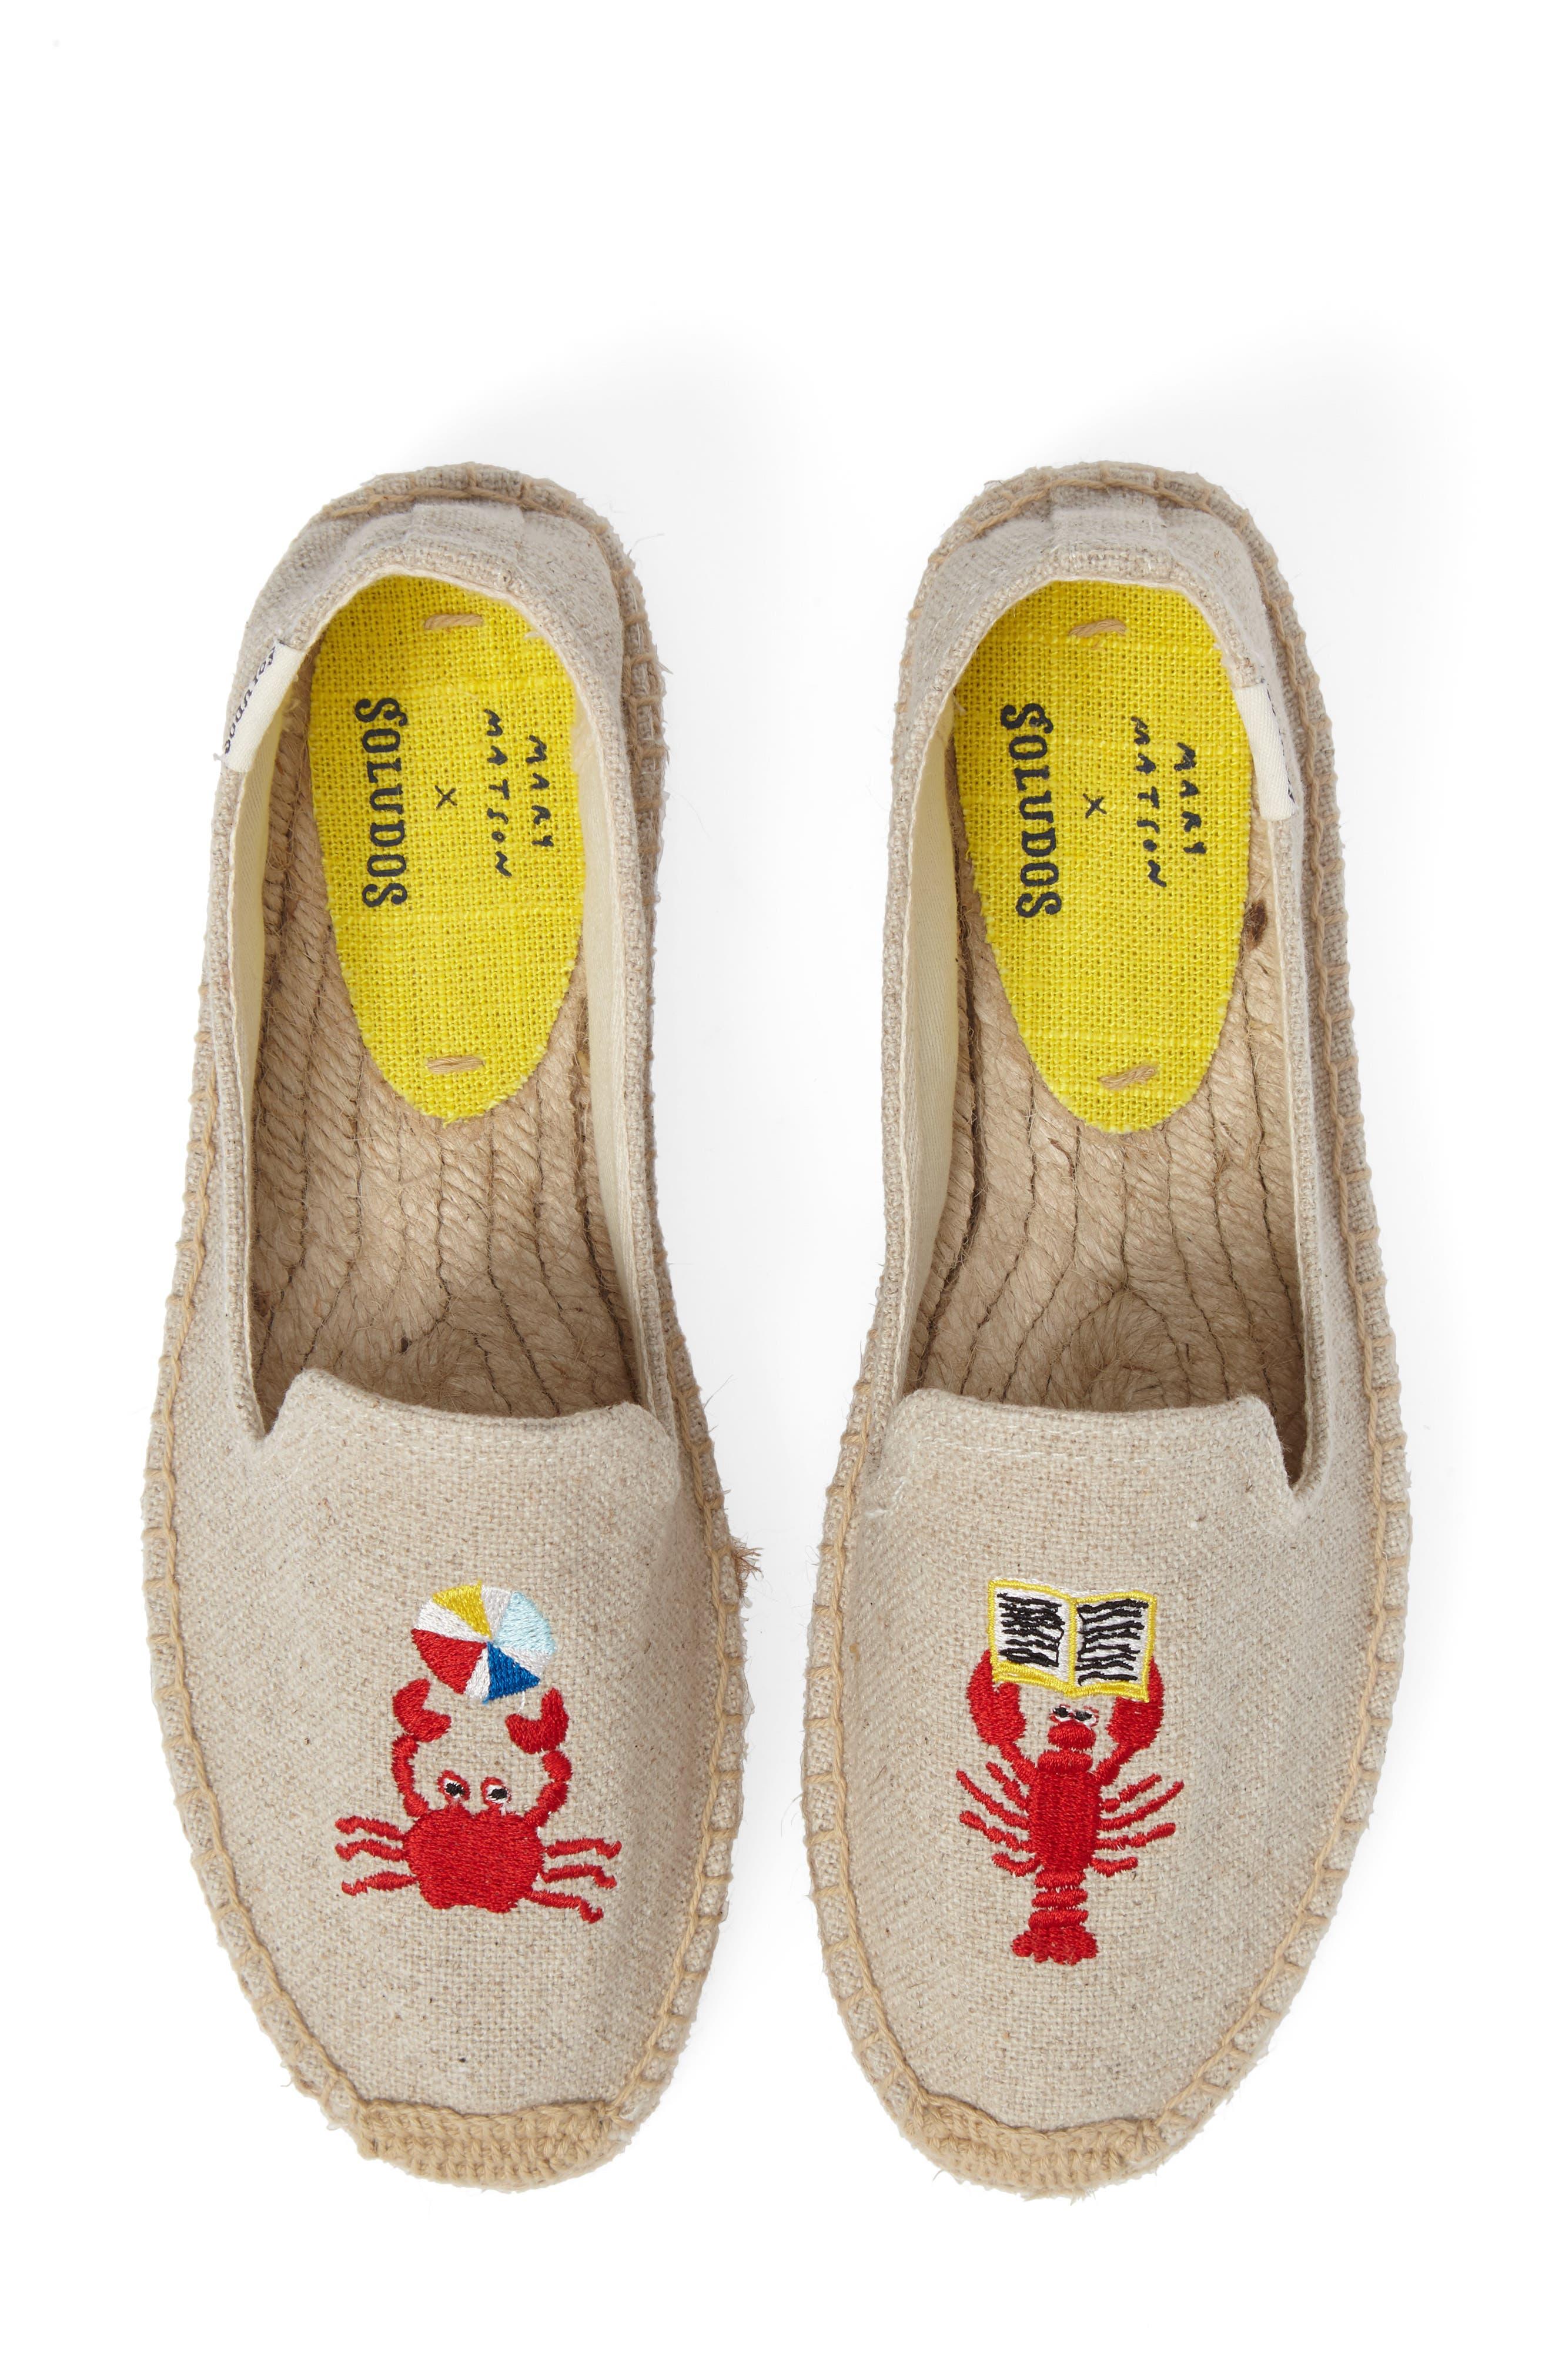 Soludos x Mary Matson Lobster & Crab Platform Espadrille (Women)